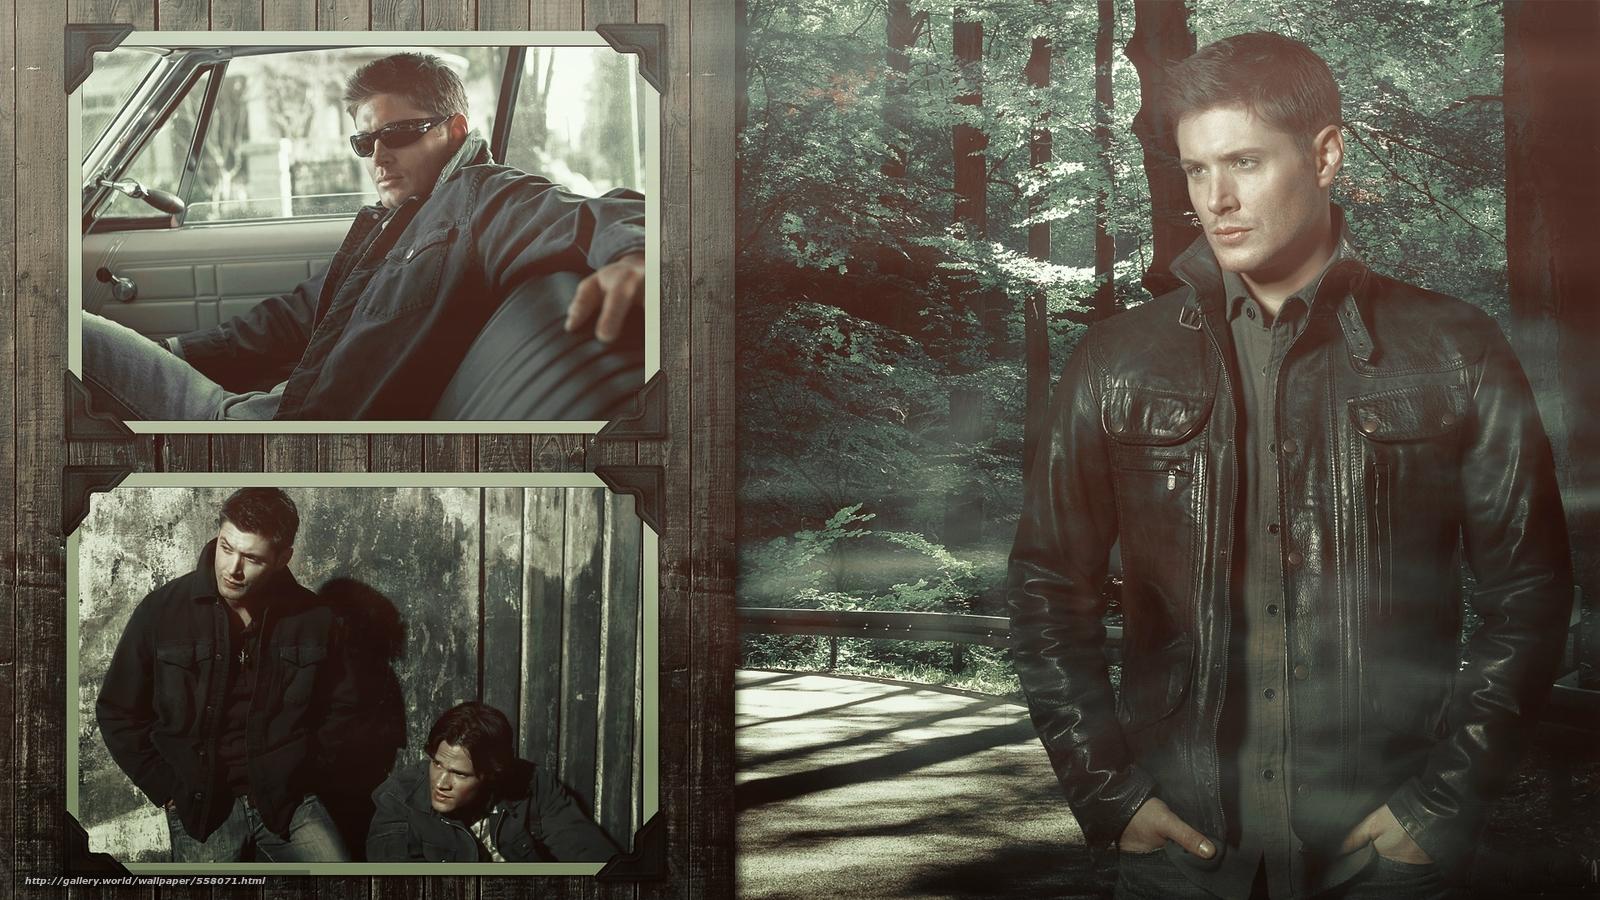 Baixar Wallpaper Sobrenatural,  Jensen Ackles,  Jared Padalecki,  filme Papis de parede grtis na resoluo 1920x1080 — quadro №558071